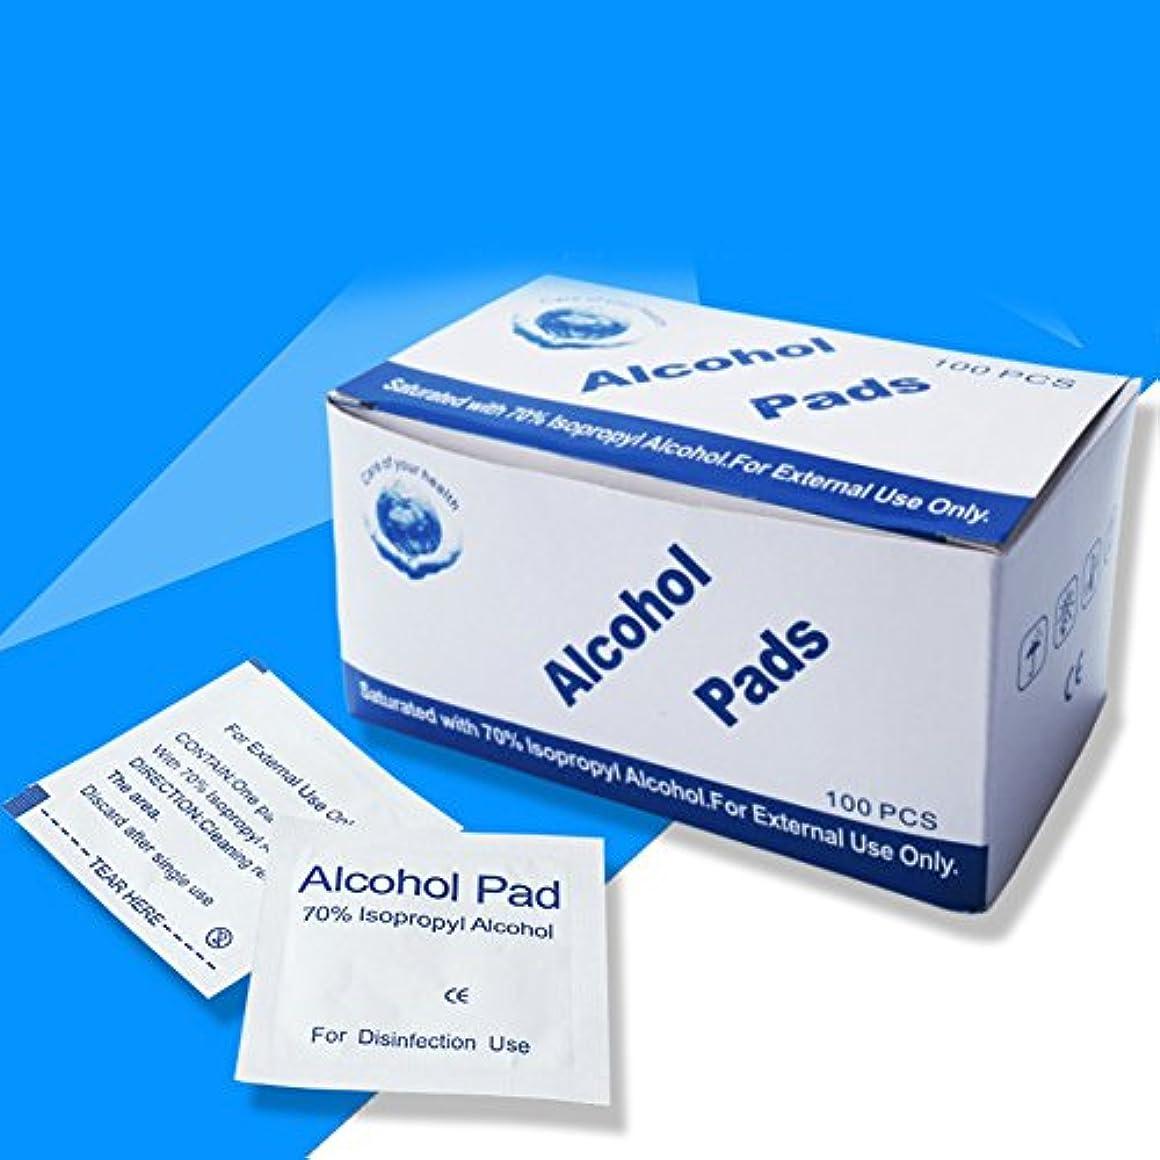 Rabugoo 100個/箱アルコールタブレット使い捨て医療消毒傷ついたアルコールワイプ旅行アクセサリー